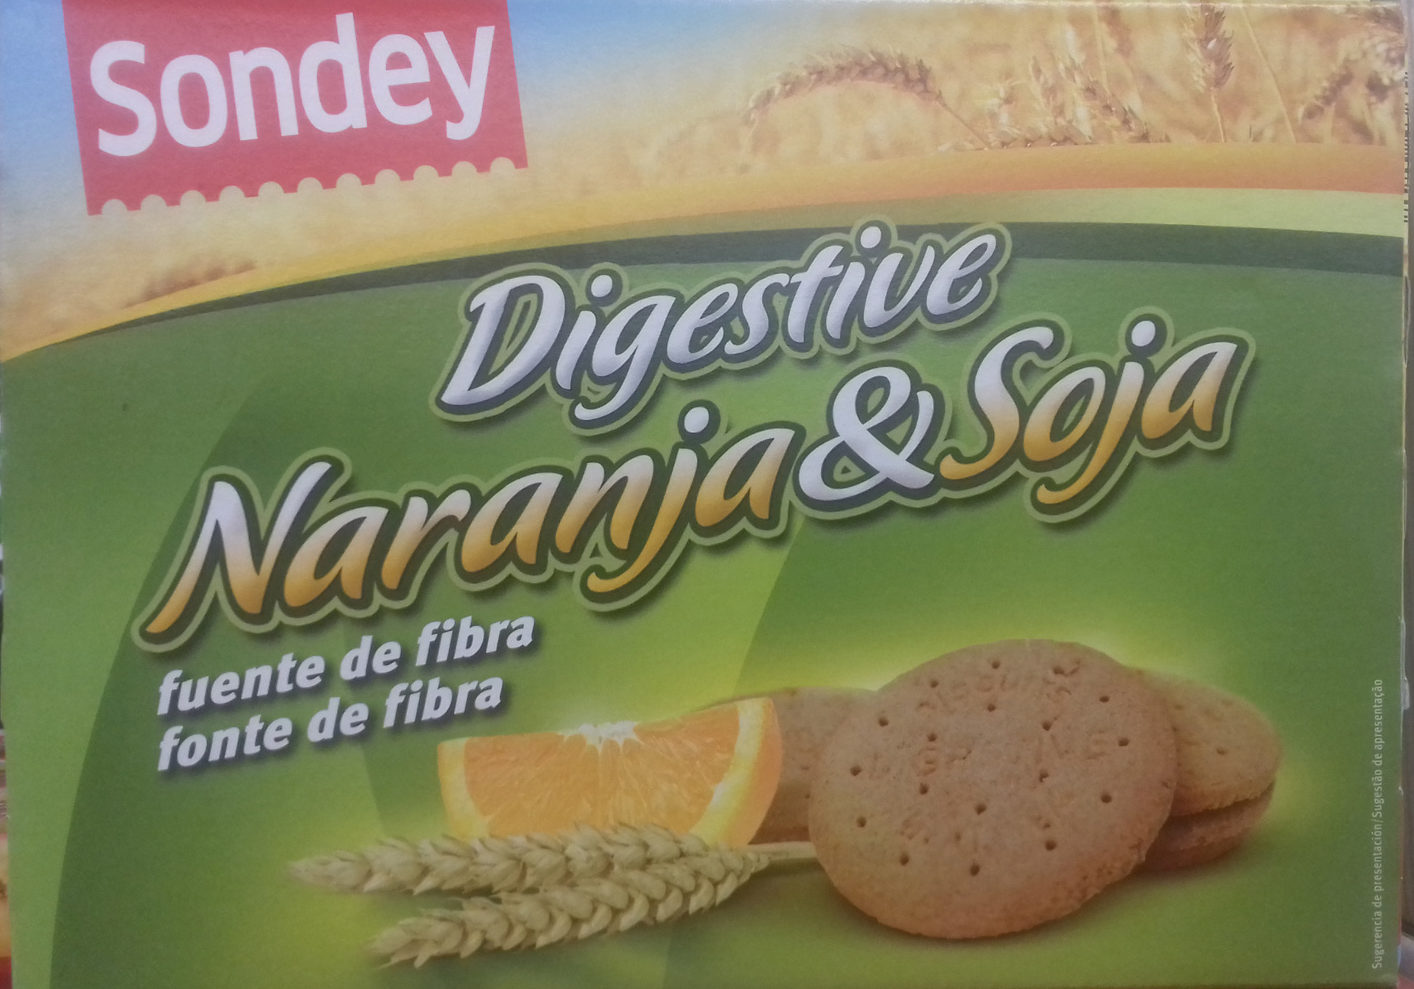 82156fb850 Galletas Digestive Naranja & Soja - Sondey - 800 g (2 x 400 g)